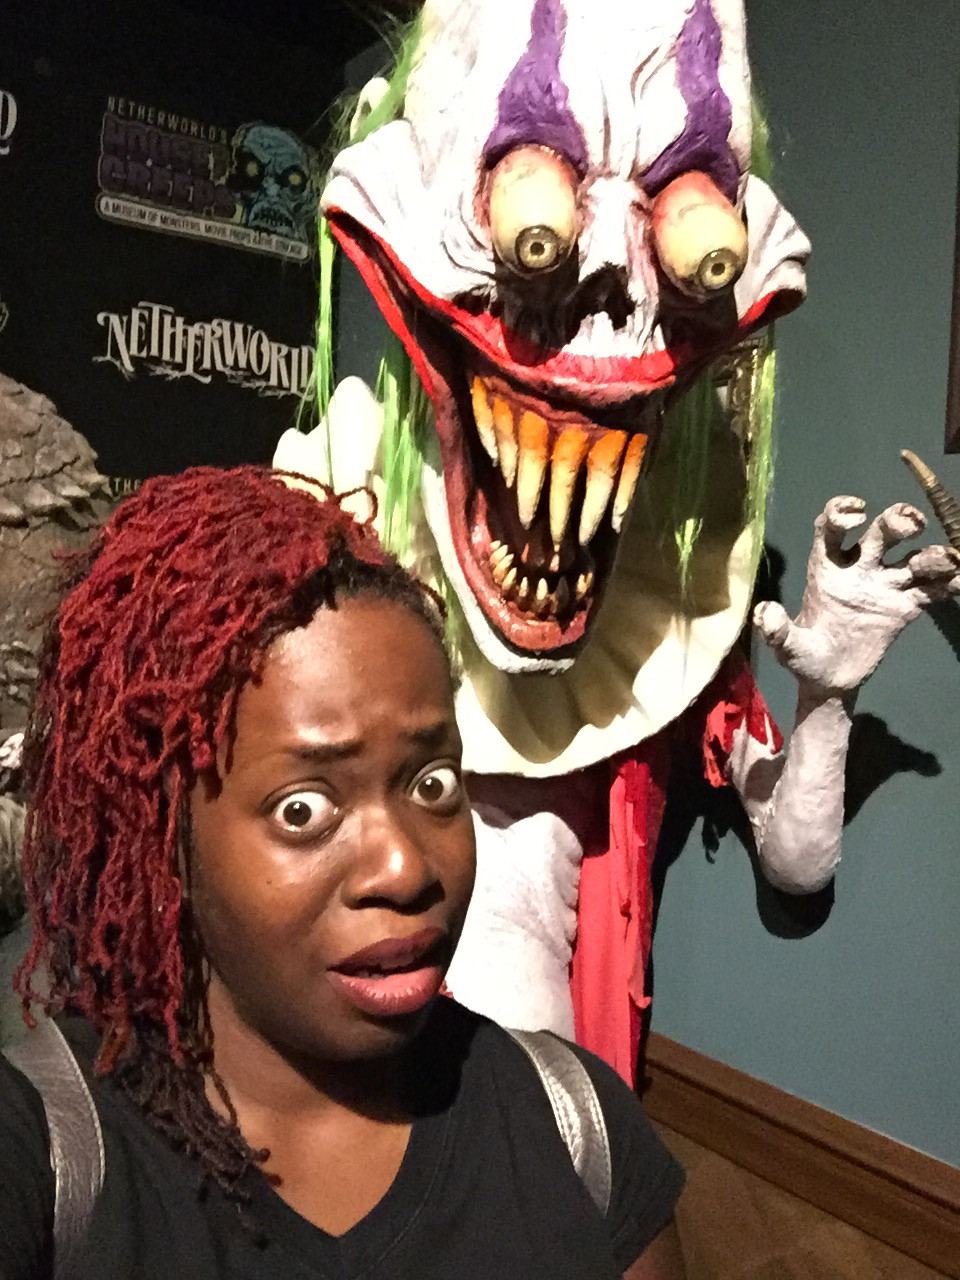 Nationally-Acclaimed NETHERWORLD Haunted House Extends Scary Season